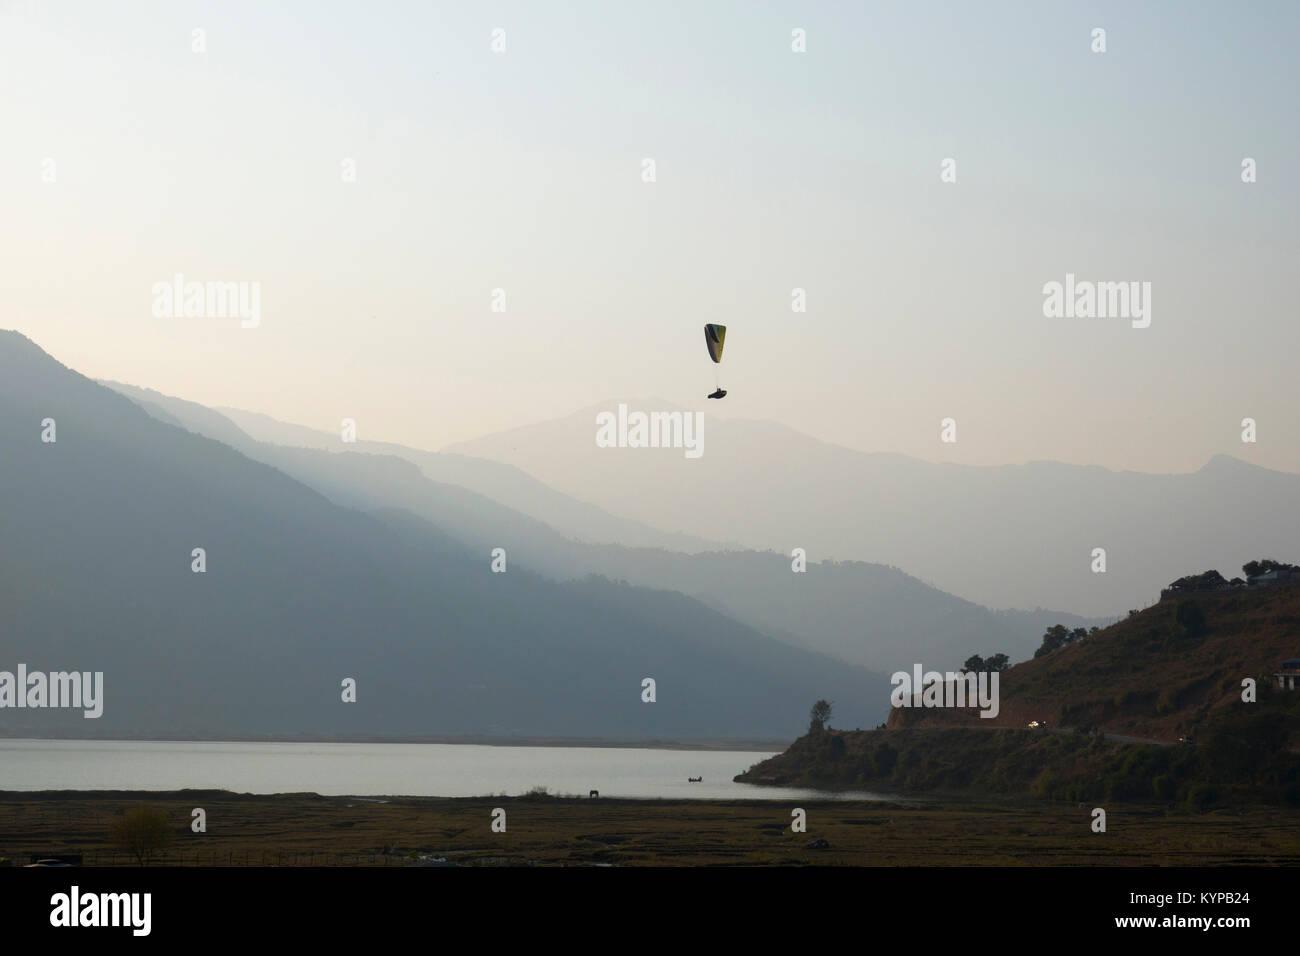 Solo paragliding above Phewa Lake in Pokhara, Nepal - Stock Image